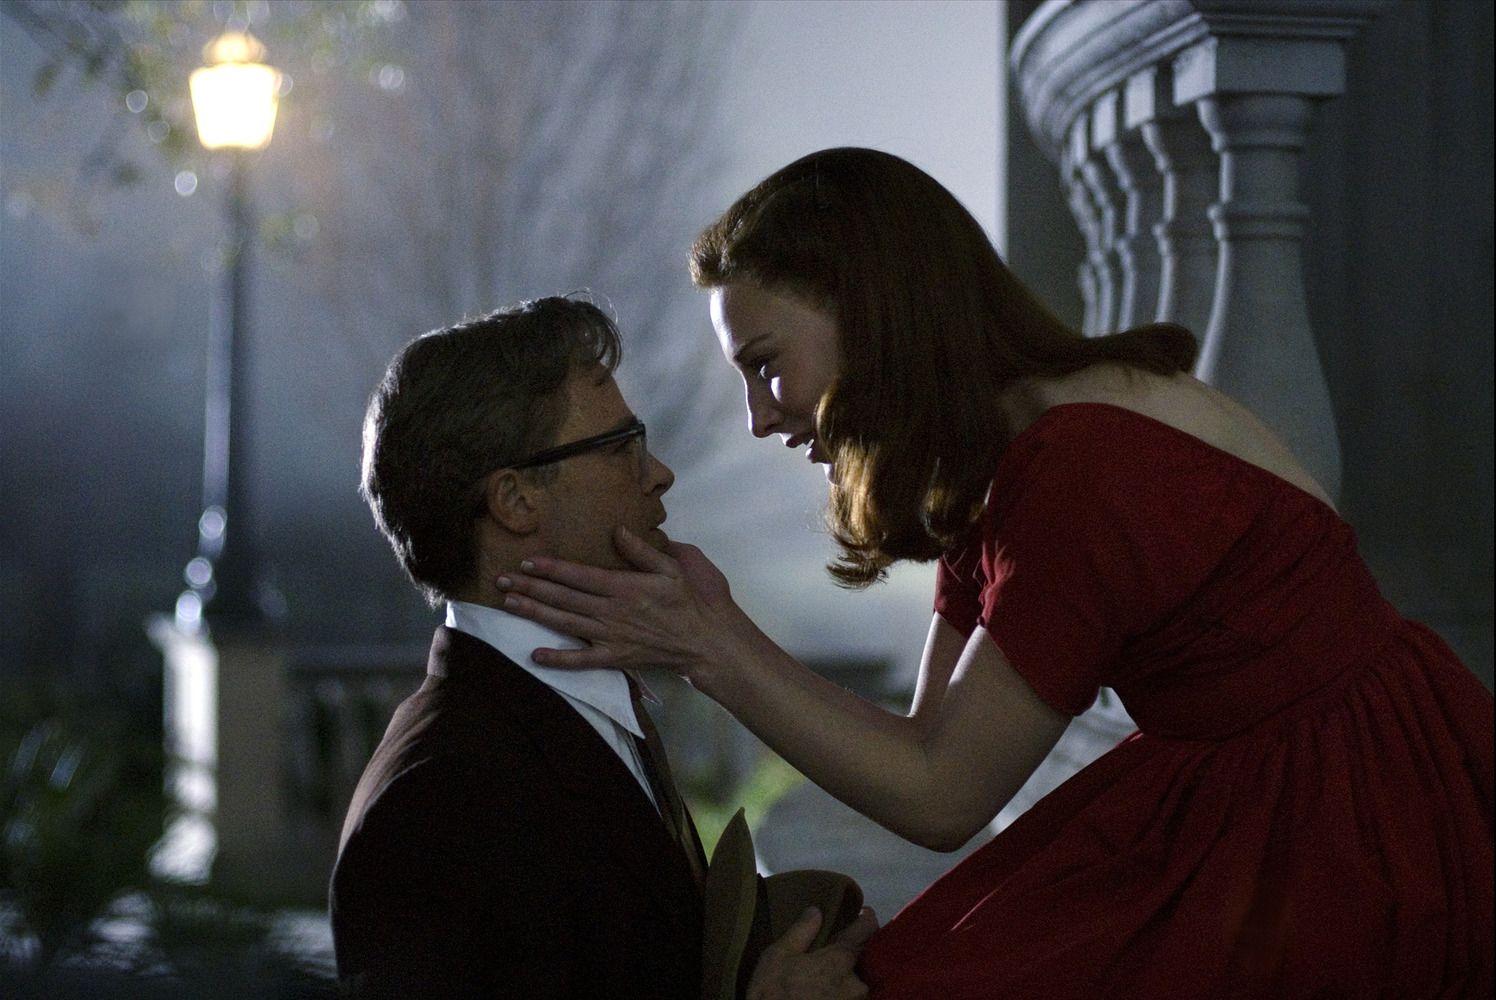 Brad Pitt et Cate Blanchett dans L'Etrange Histoire de Benjamin Button de David Fincher